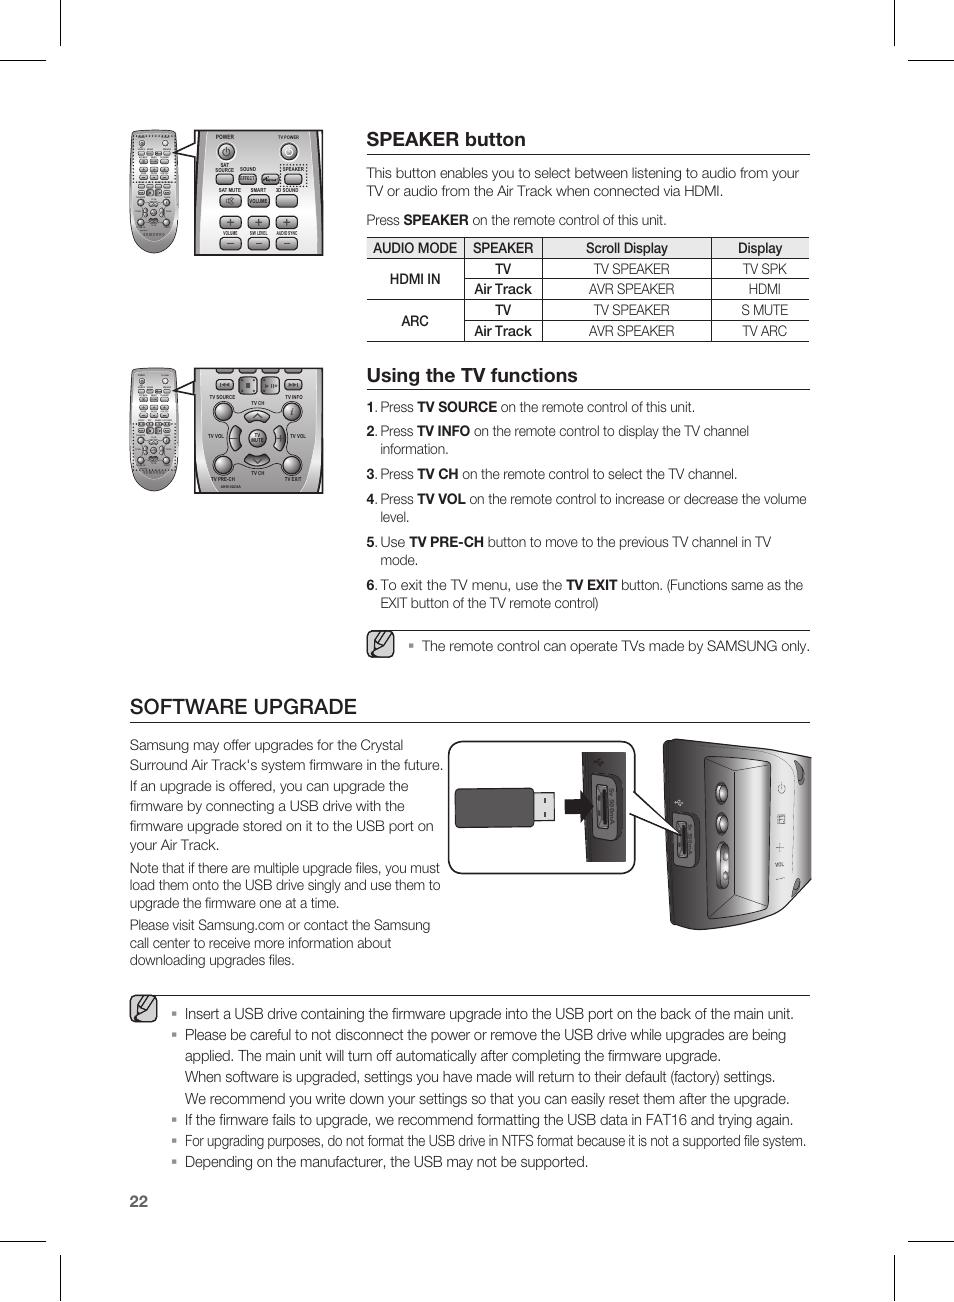 software upgrade speaker button using the tv functions samsung rh manualsdir com samsung hw 450 manual samsung hw c450 manual